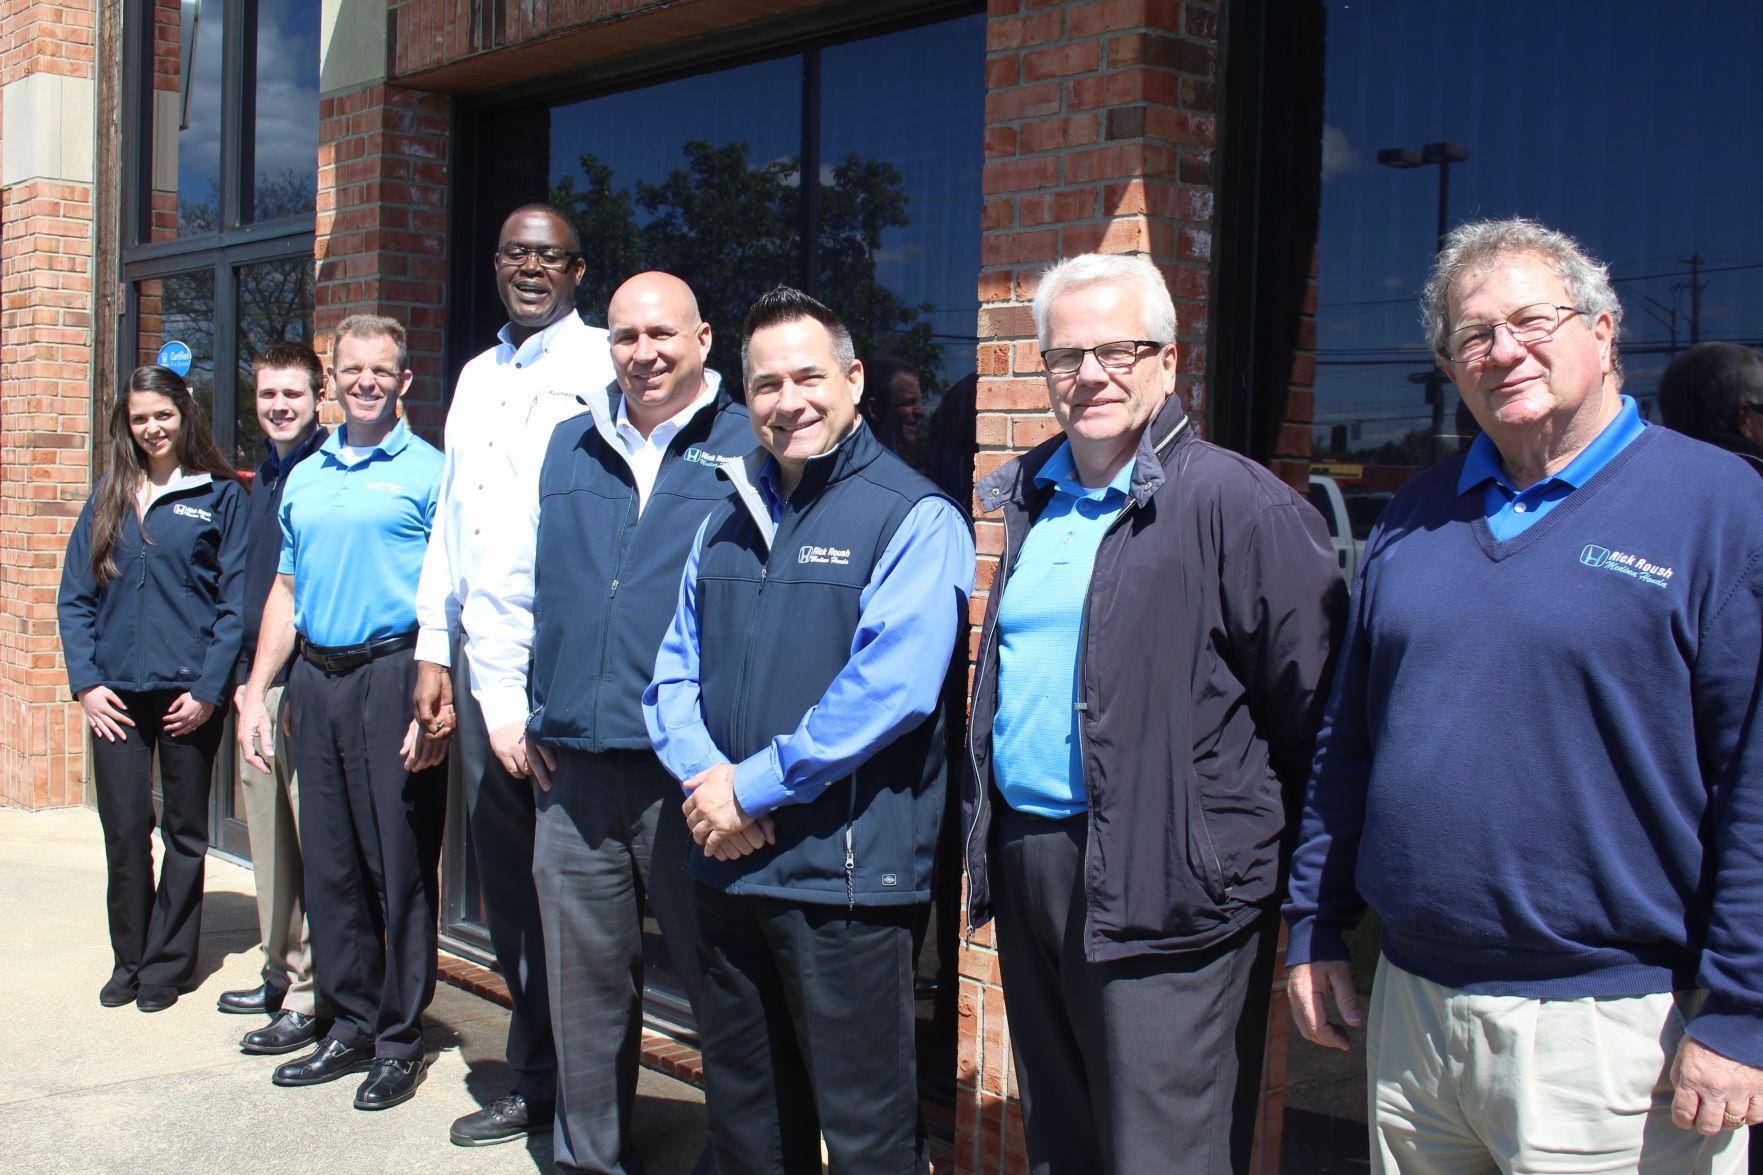 Rick Roush Sales Team